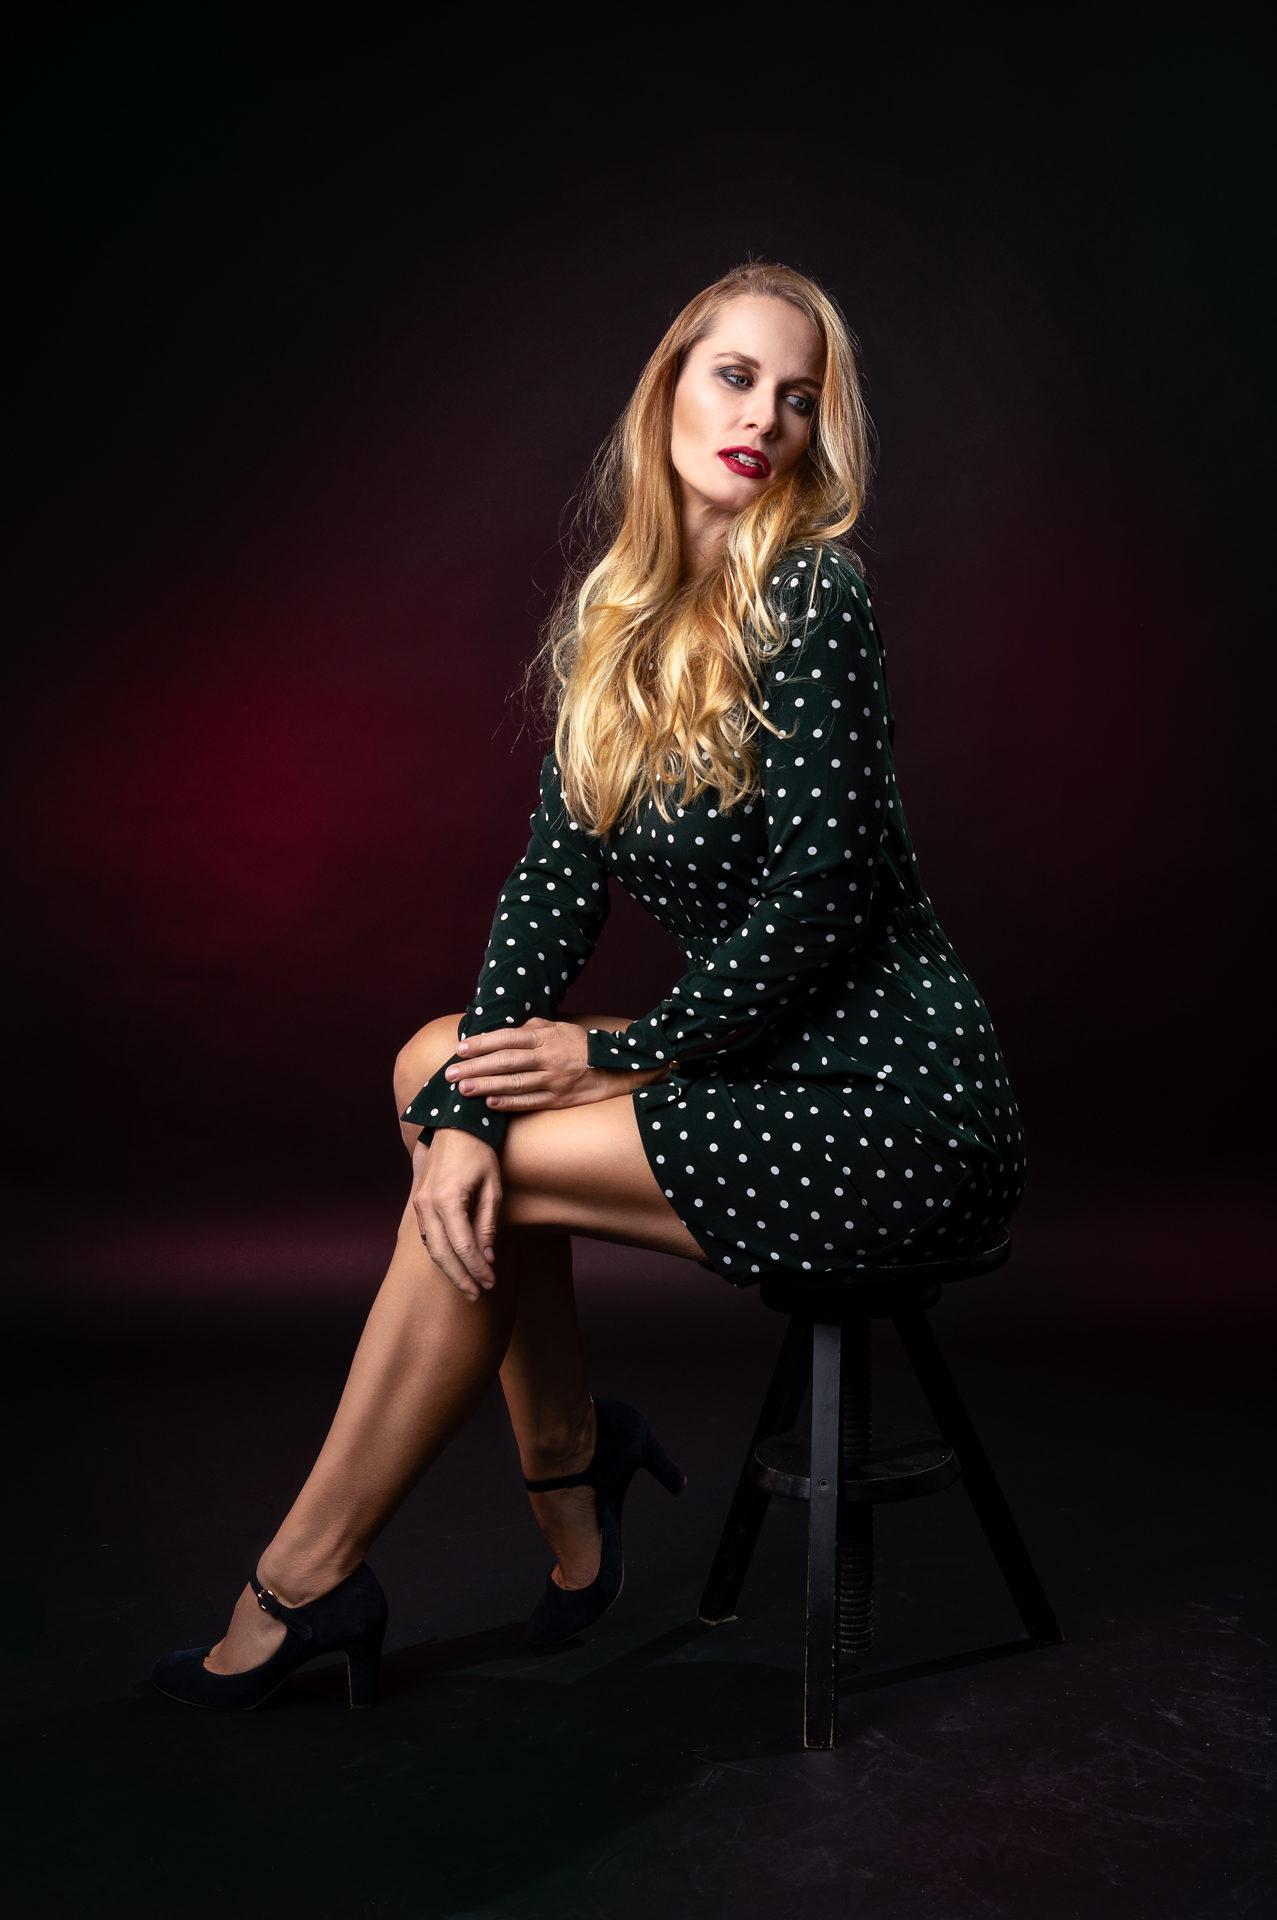 Fashionmodel im Fotostudio